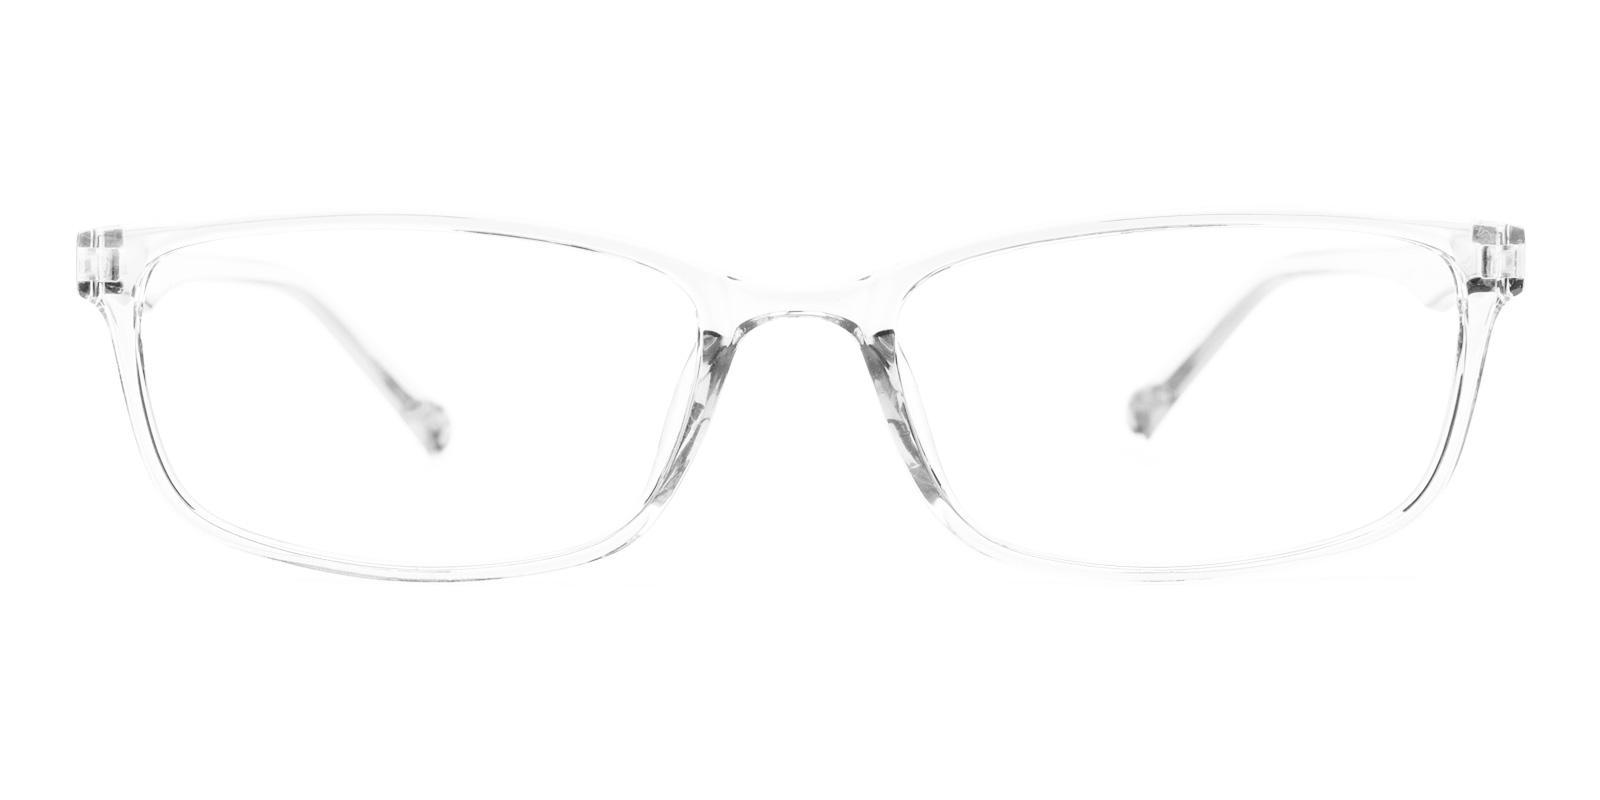 Ellis-Translucent-Rectangle-TR-Eyeglasses-detail